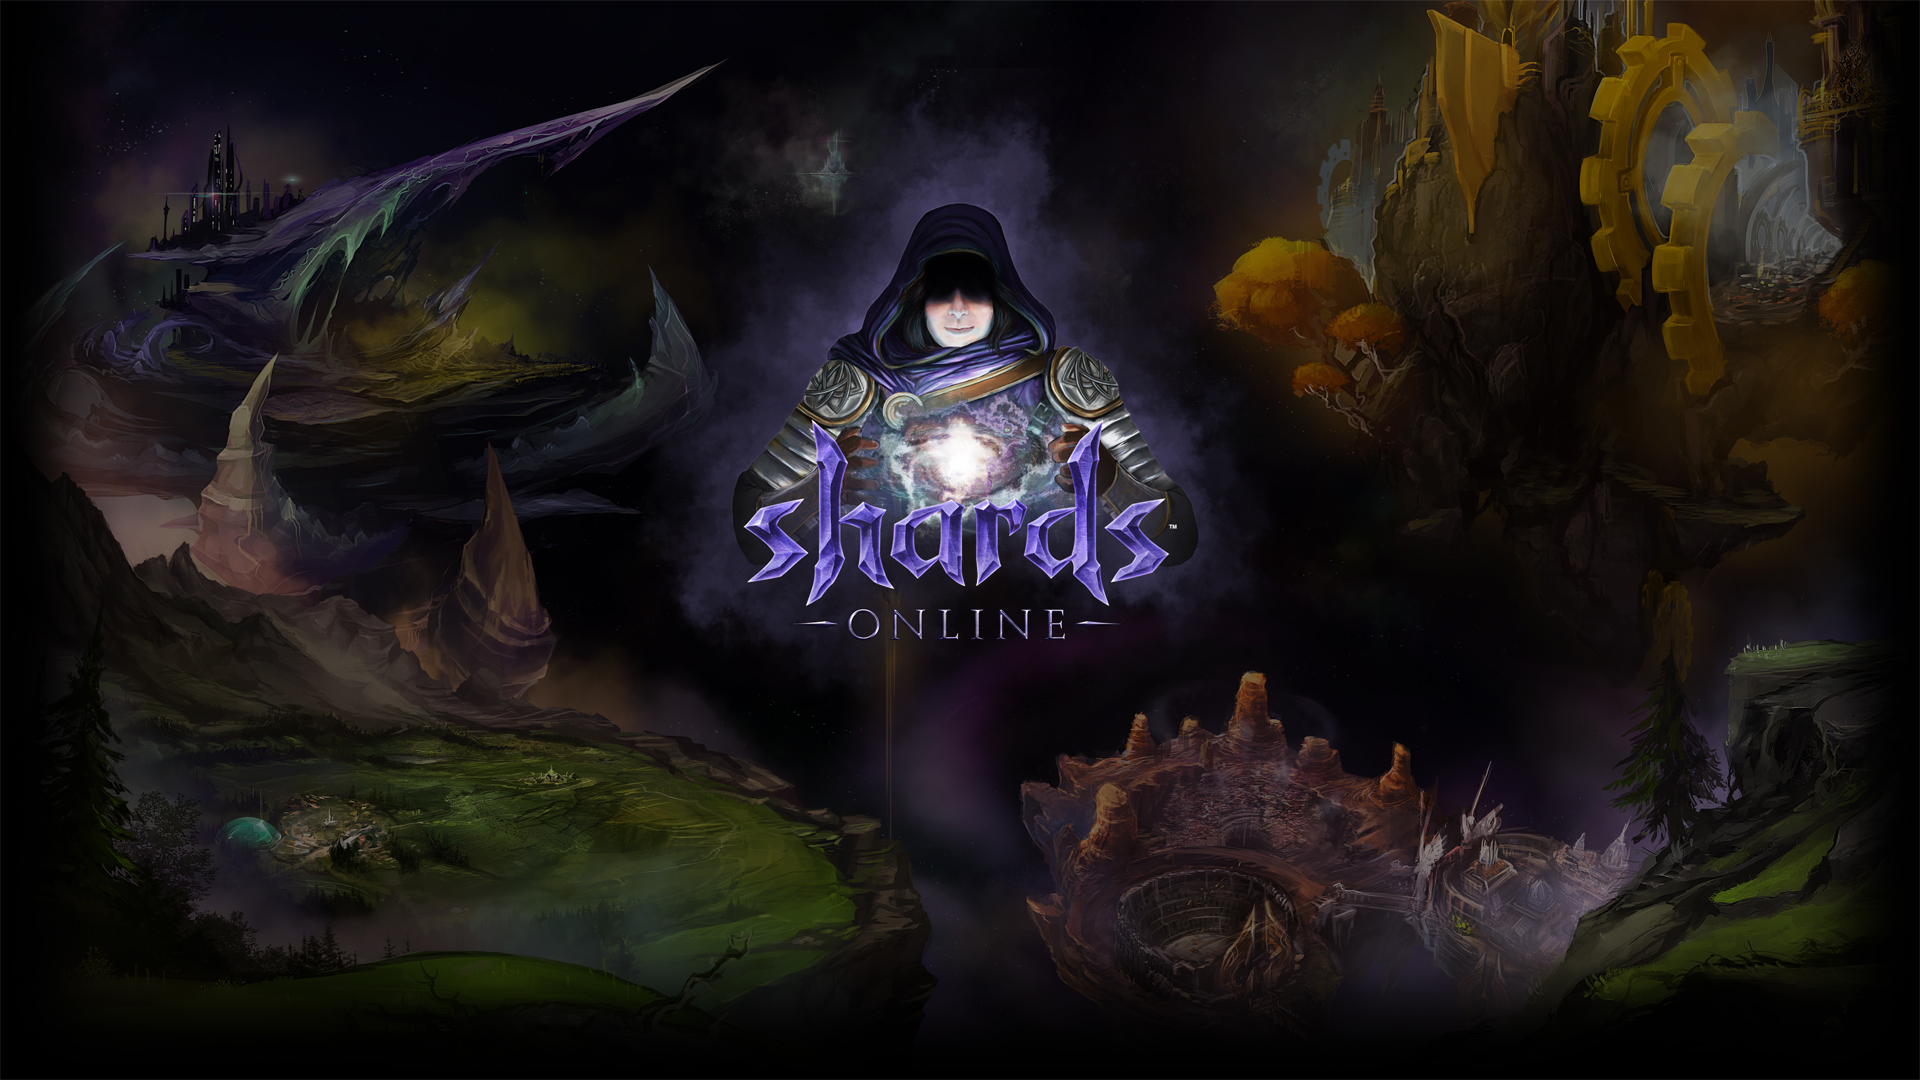 Shards Online